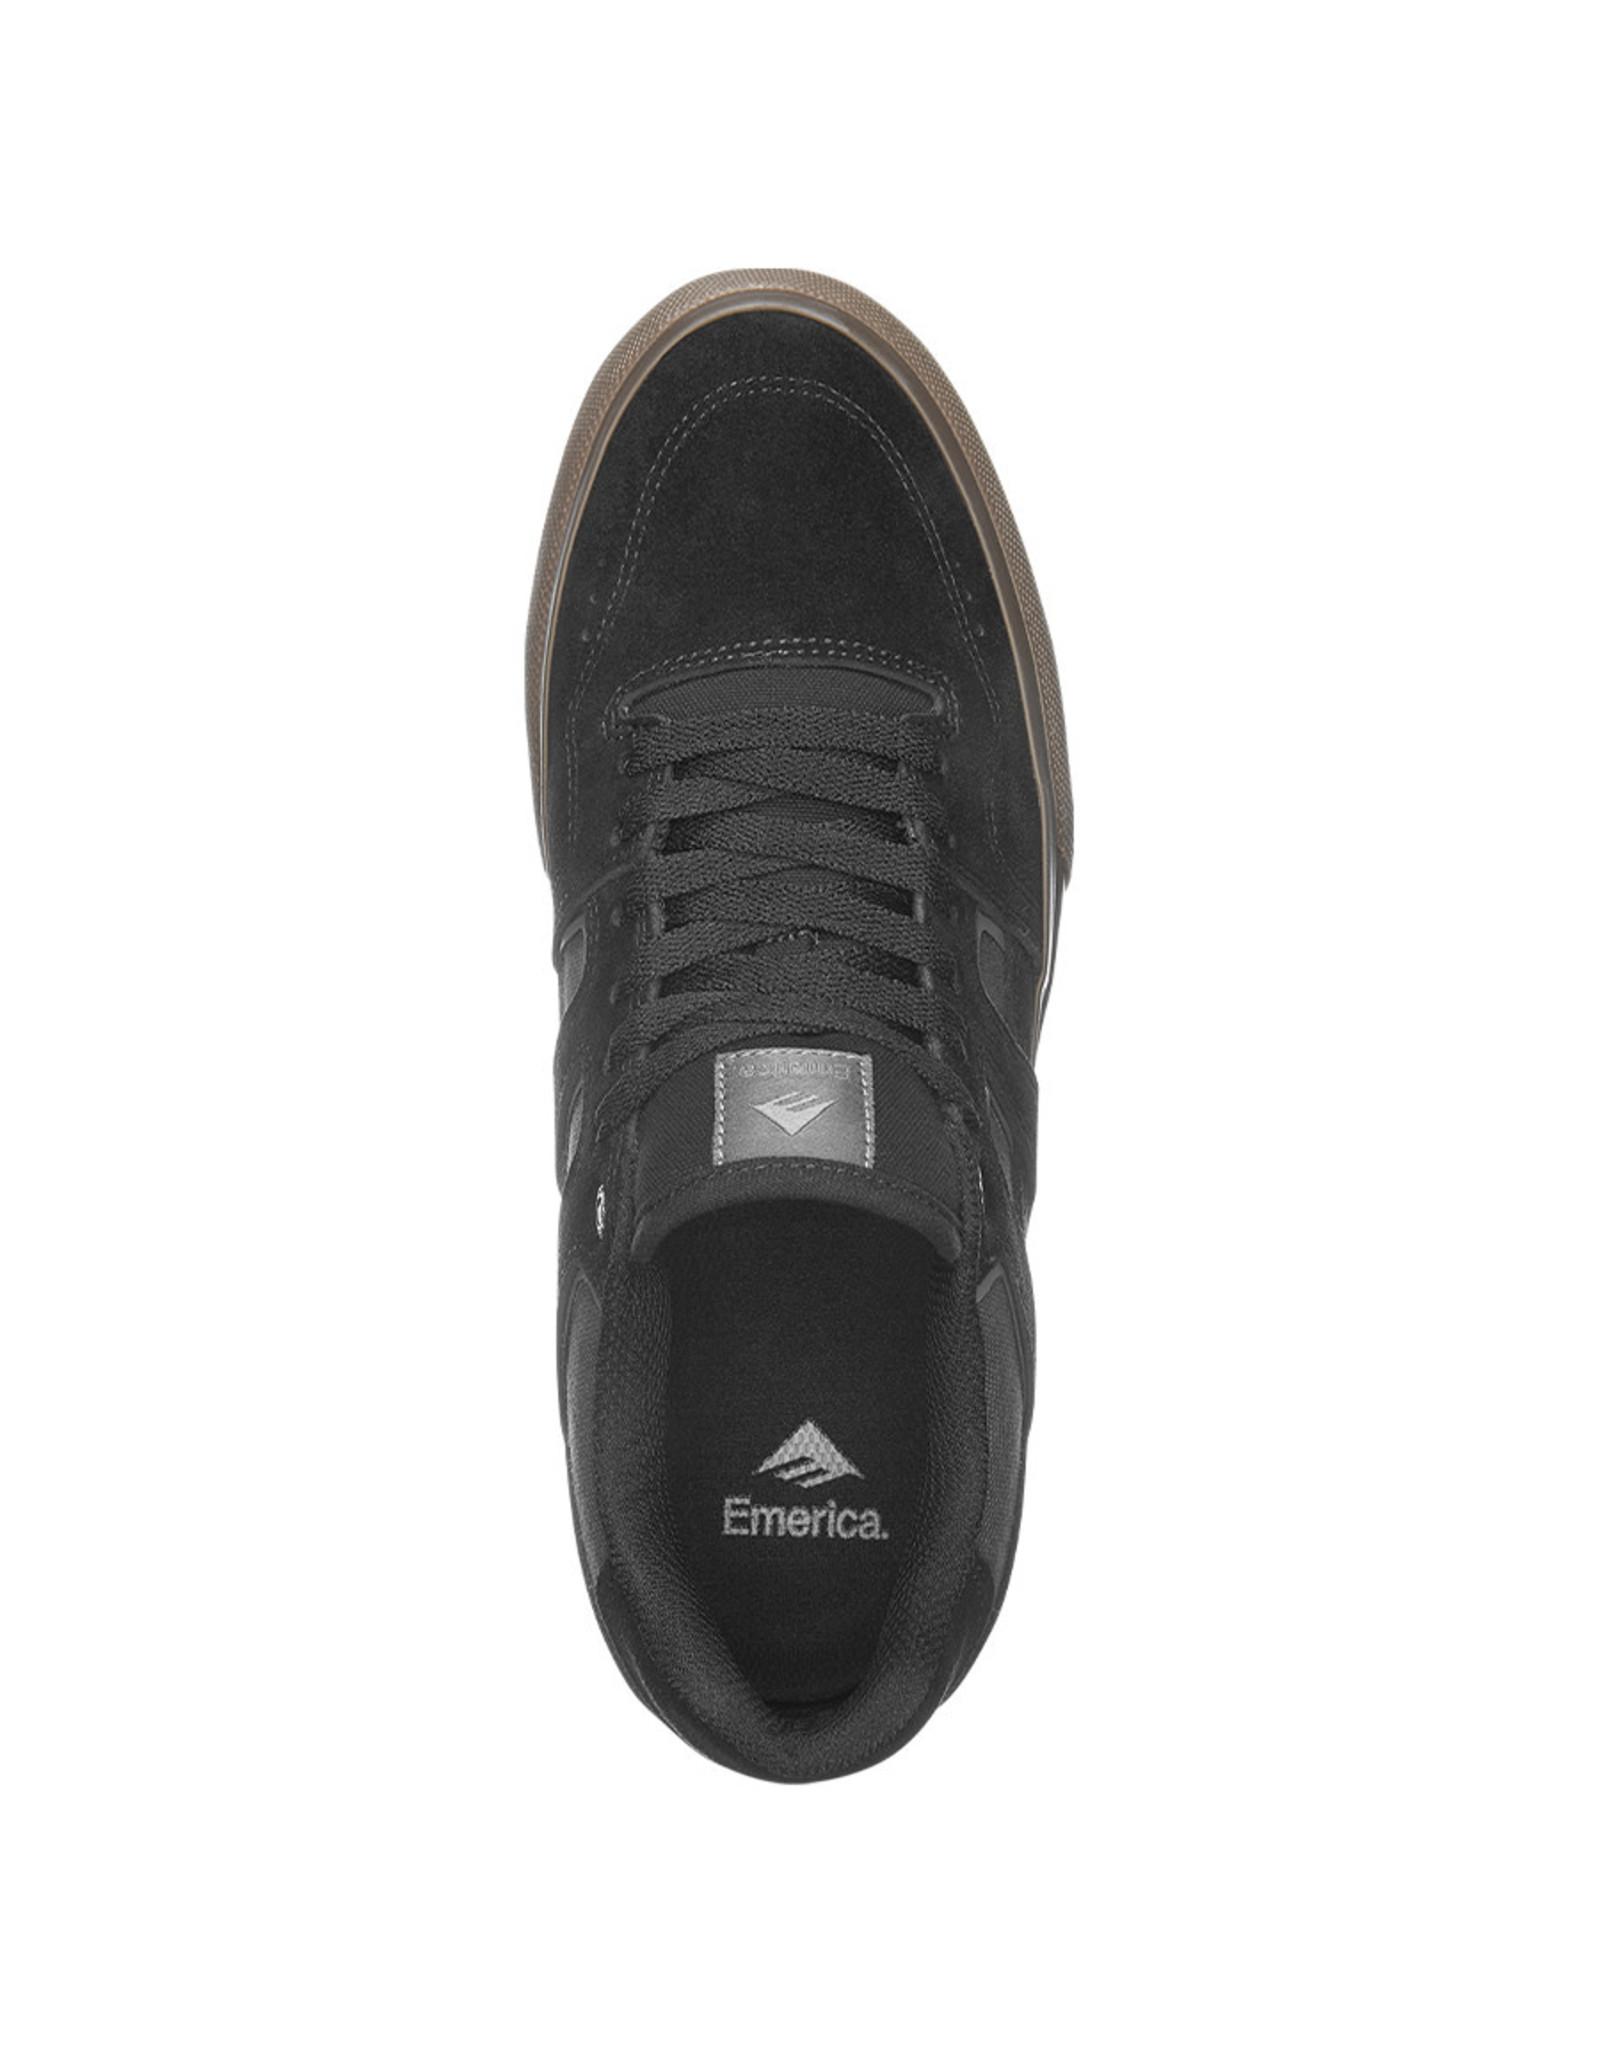 Emerica Emerica Shoe Tilt G6 Vulc (Black/Grey/Gum)